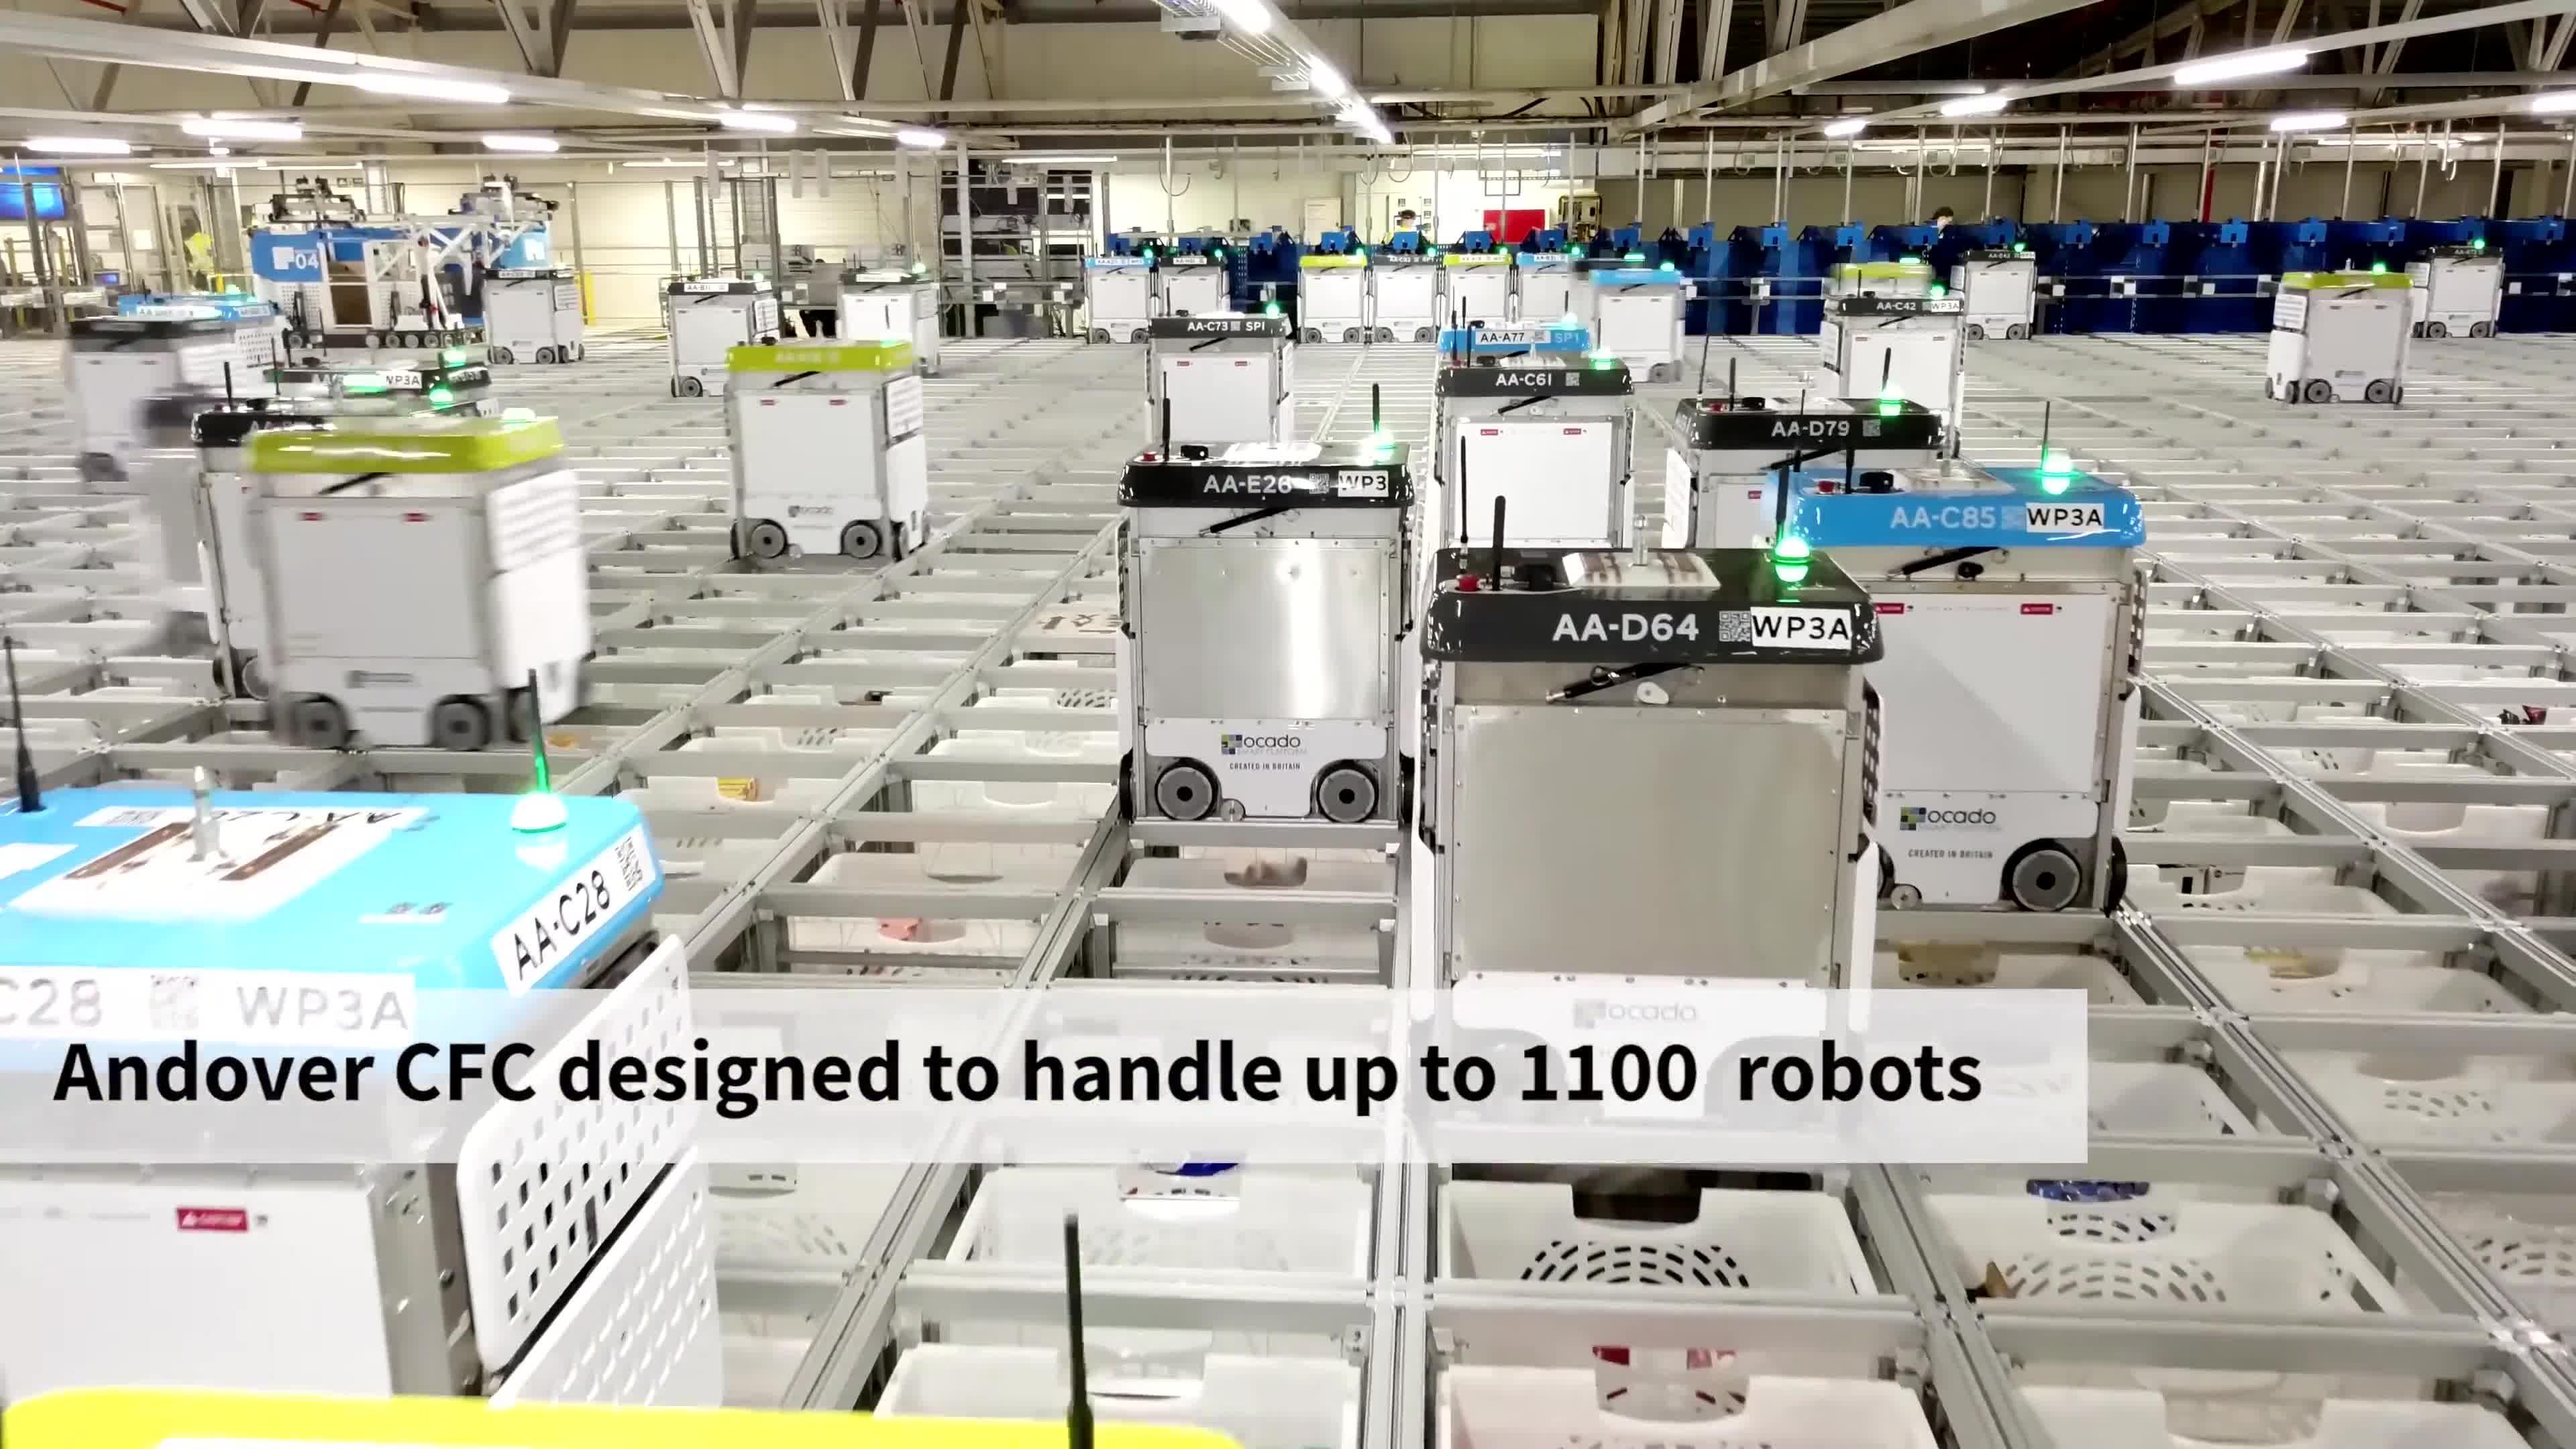 AI, Ocado, automation, engineering, robotics, robots, technology, Inside Ocado's Andover CFC3 automated warehouse GIFs